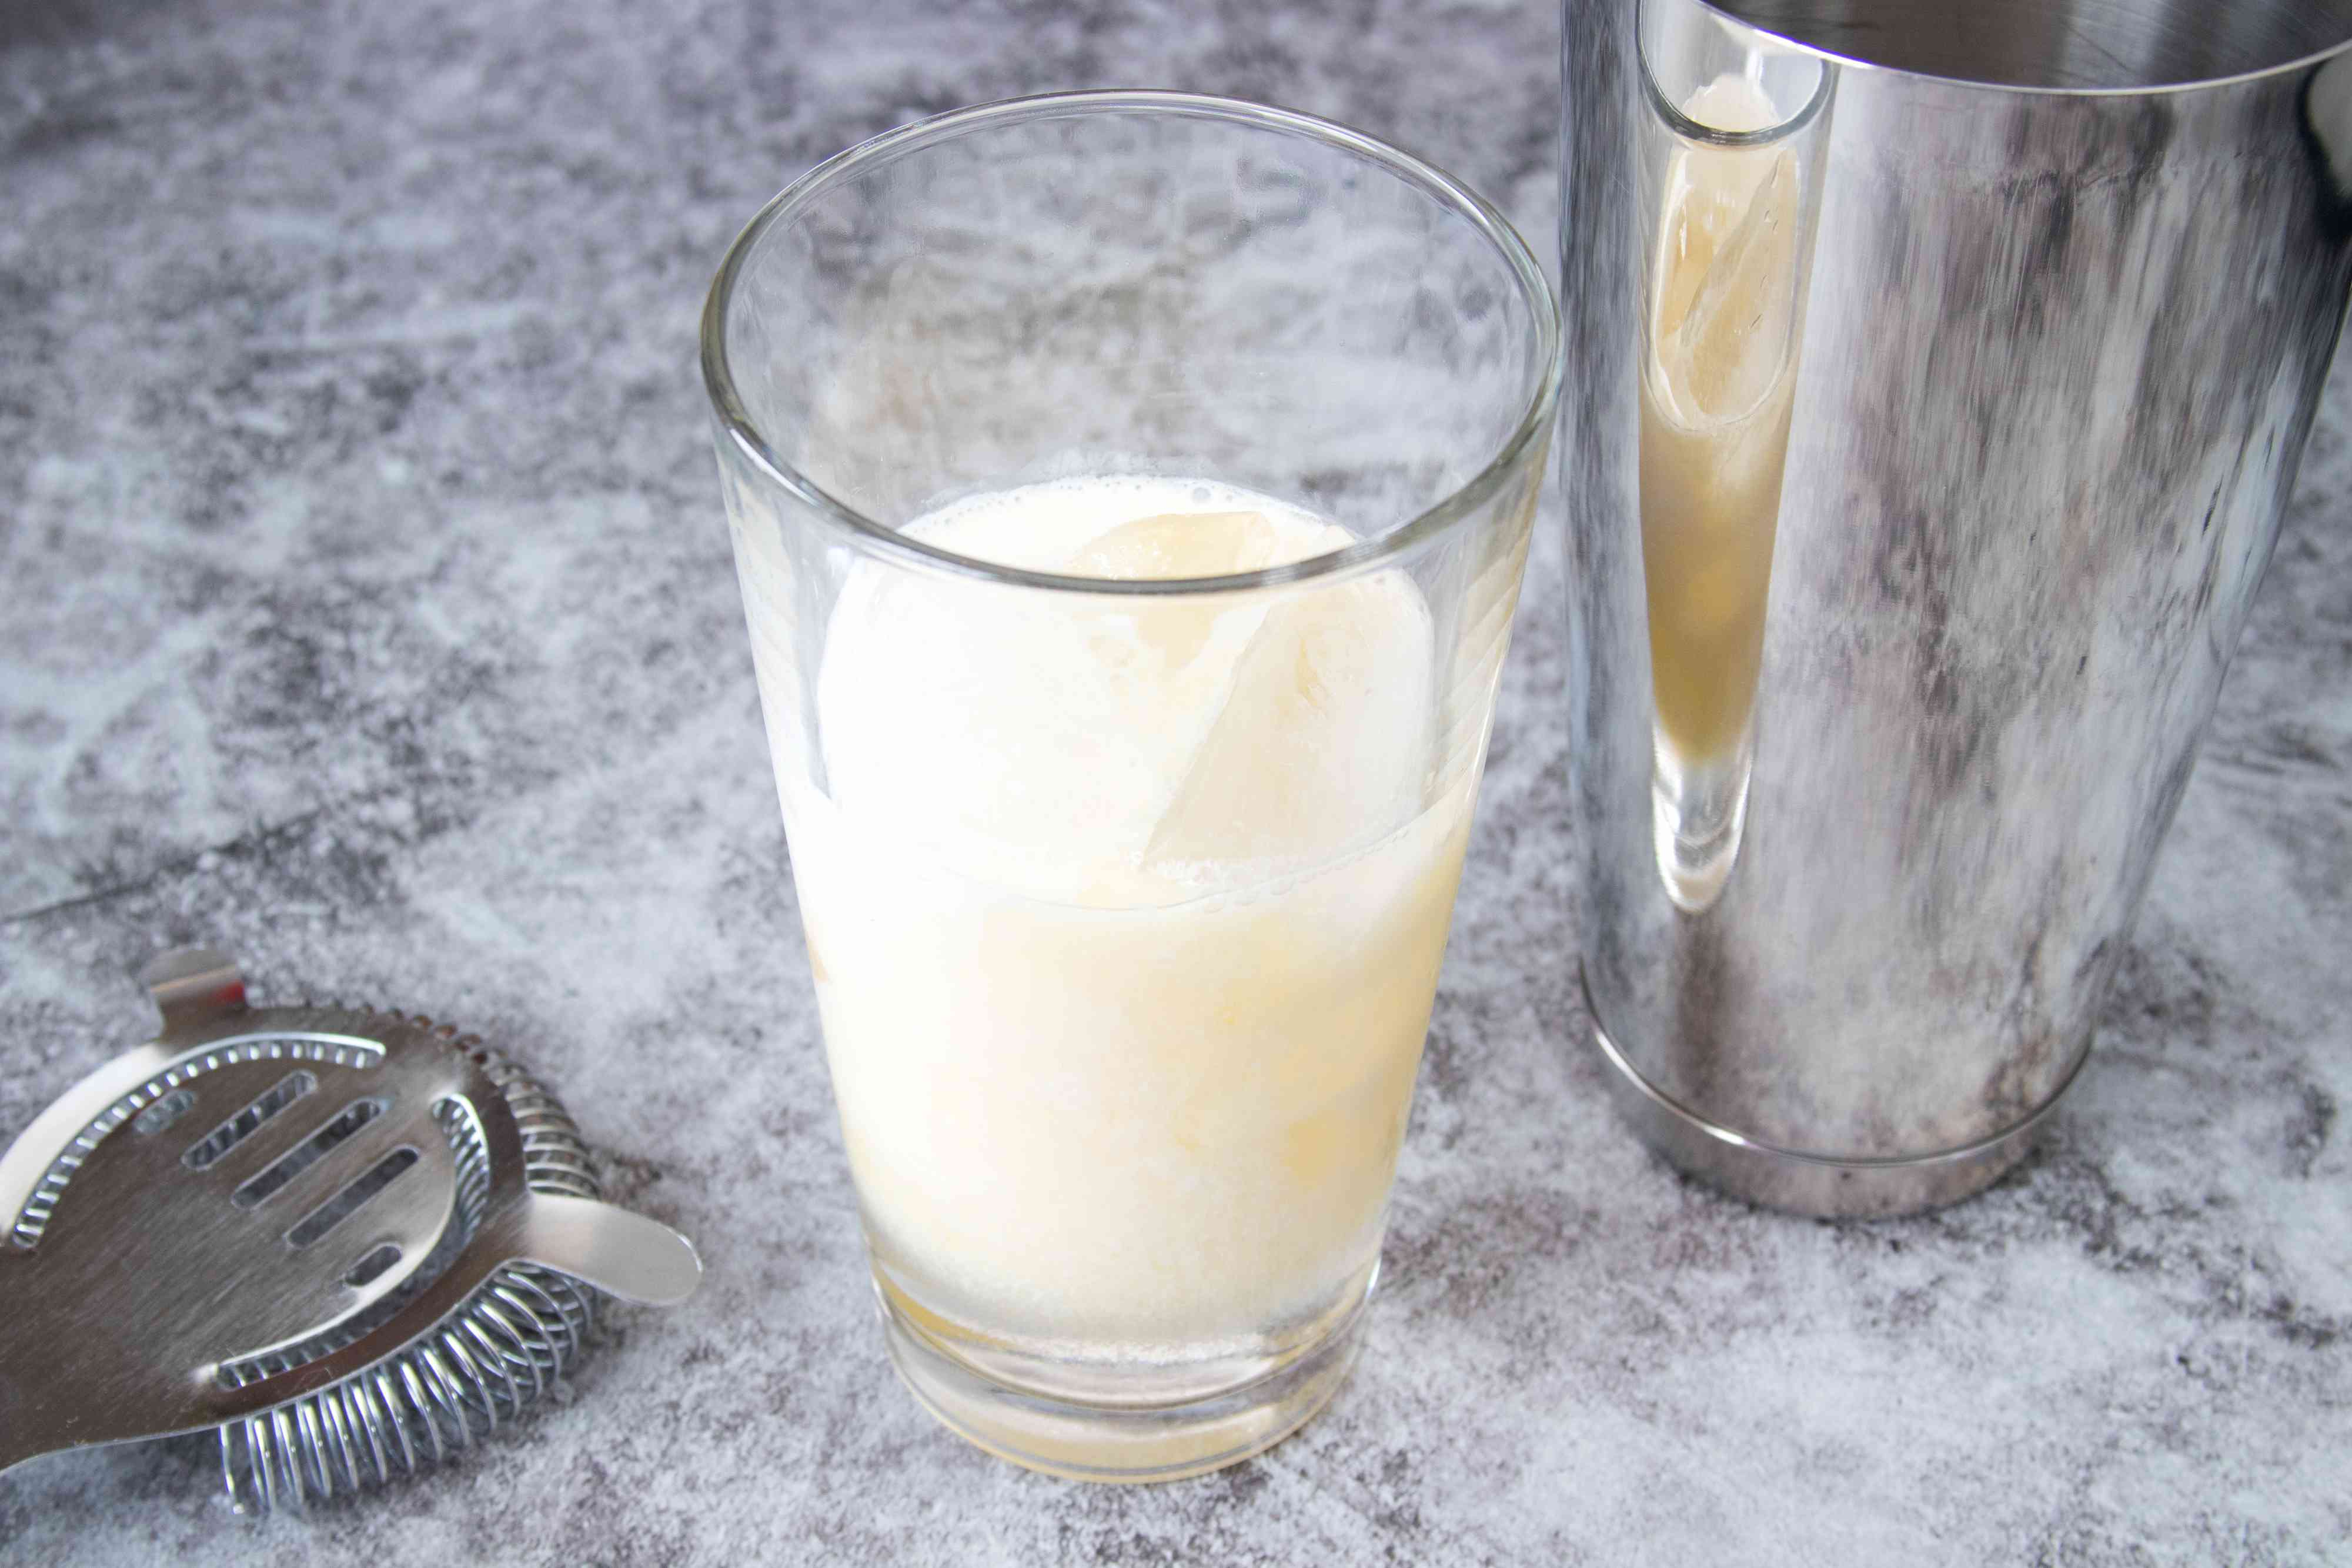 Mixing an orange creamsicle cocktail